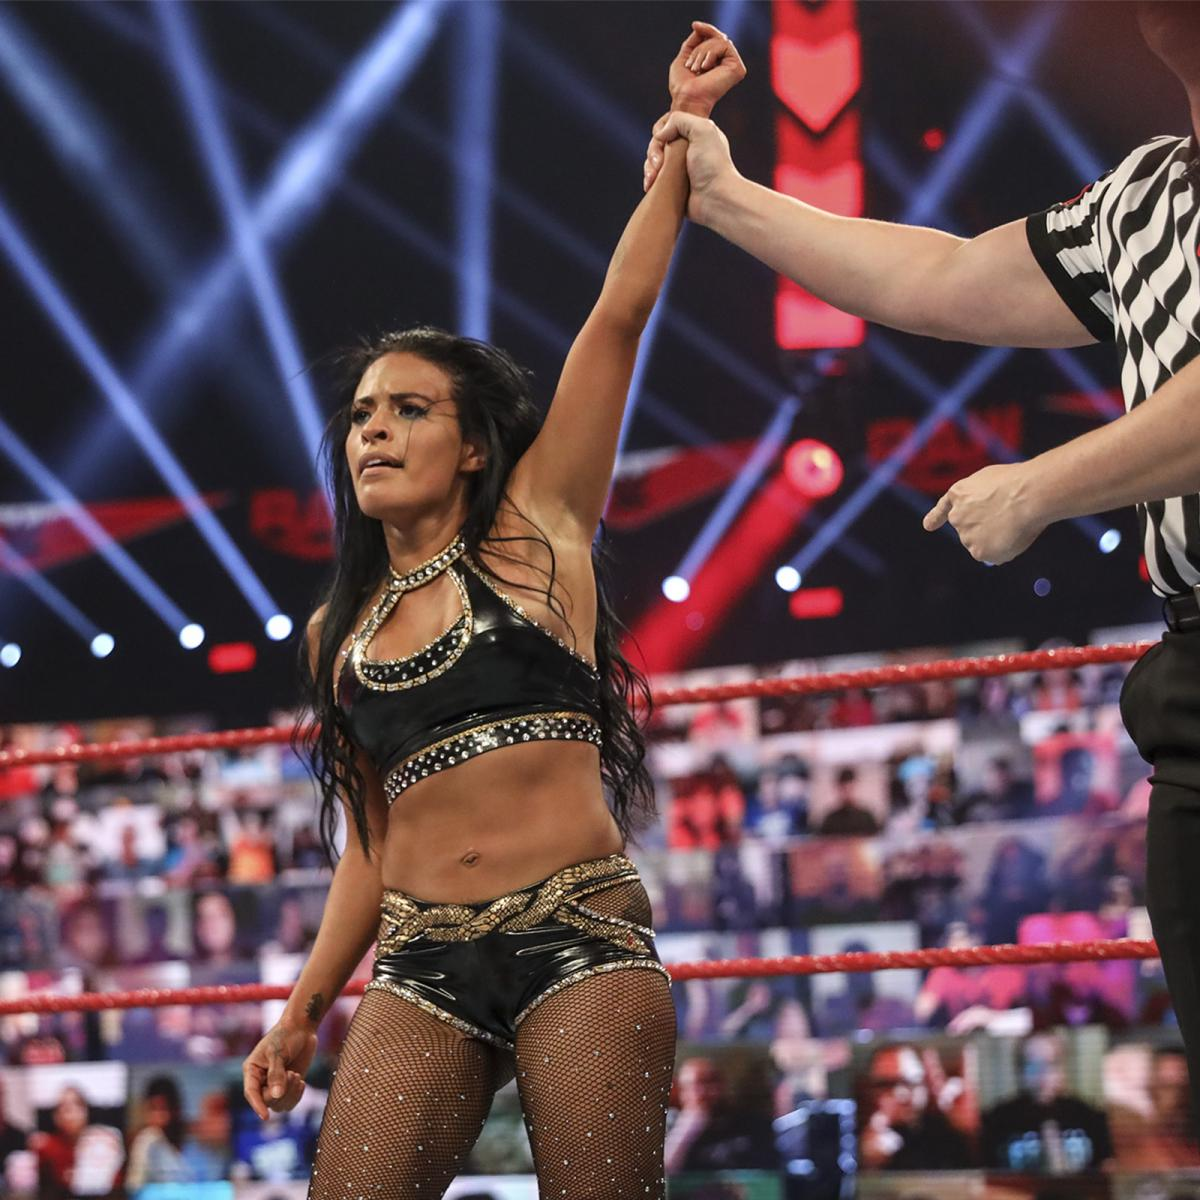 Zelina Vega on the September 21, 2020 episode of Raw - WWE